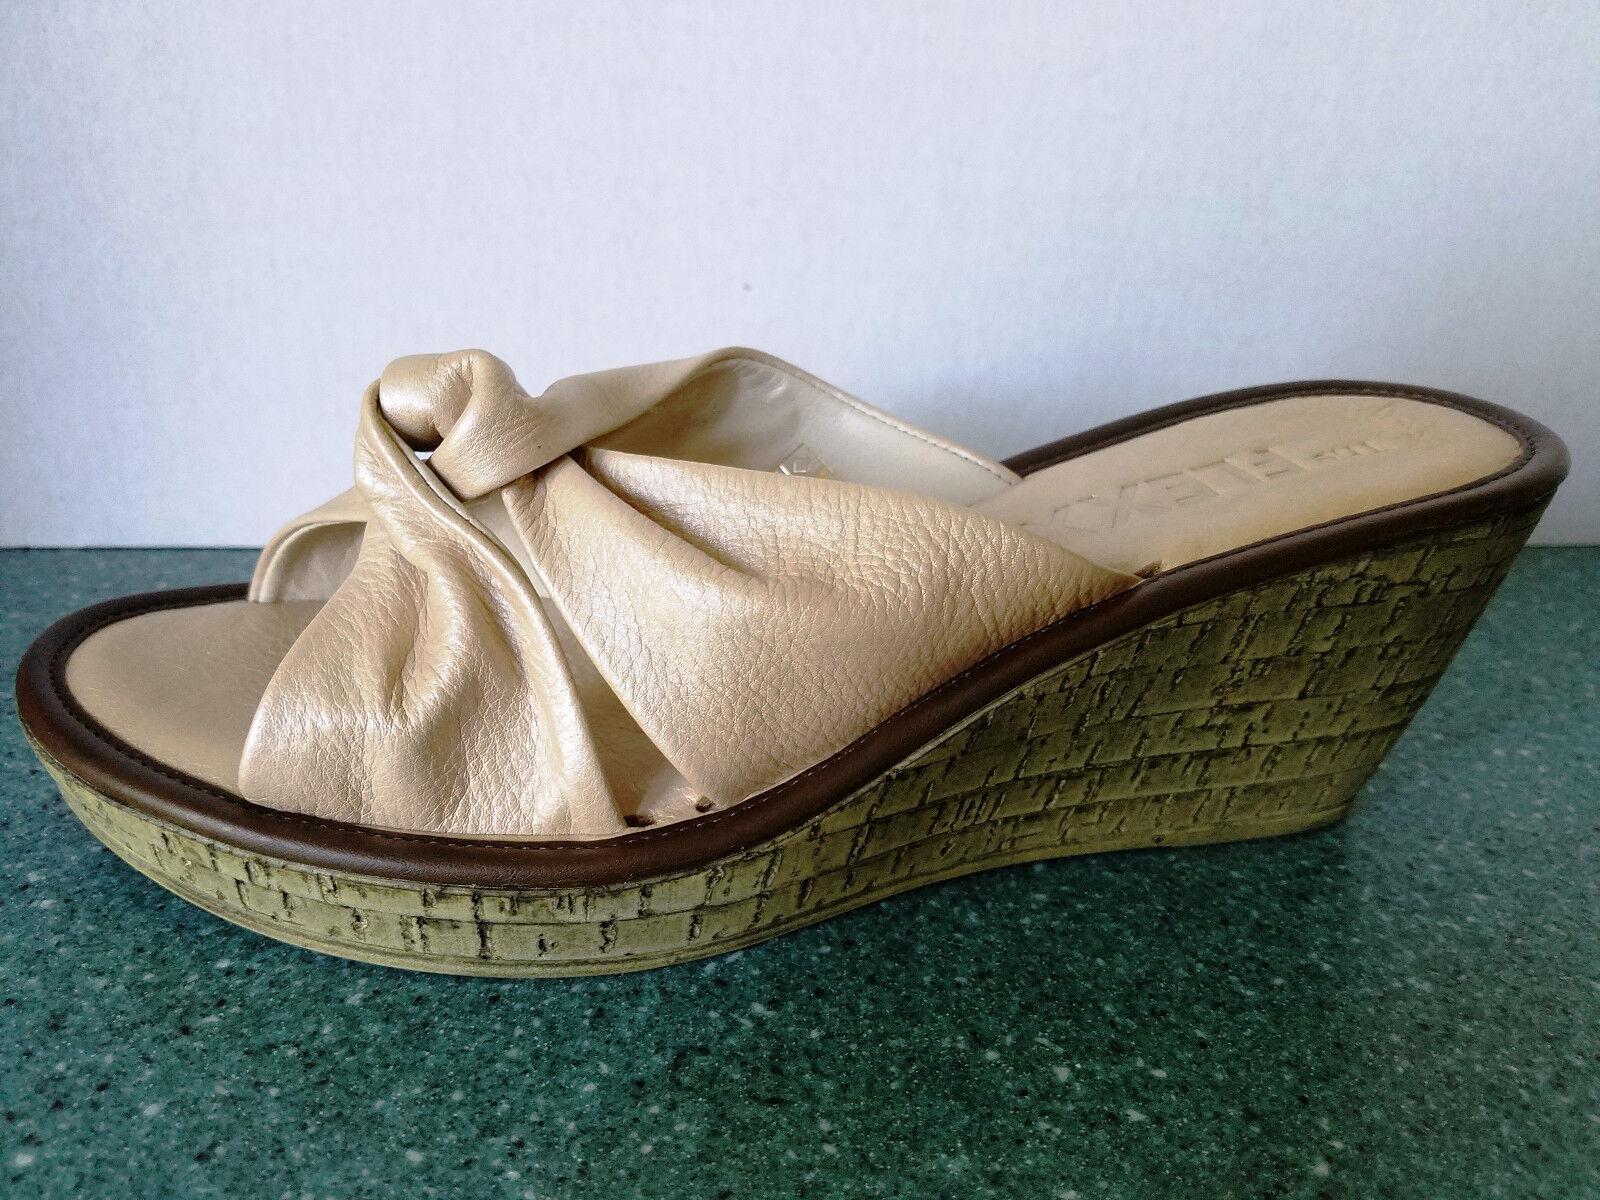 Naturalizer Women's Slide Sandals Citro, Banana Bread Size 9M US Comfort N5 NIB